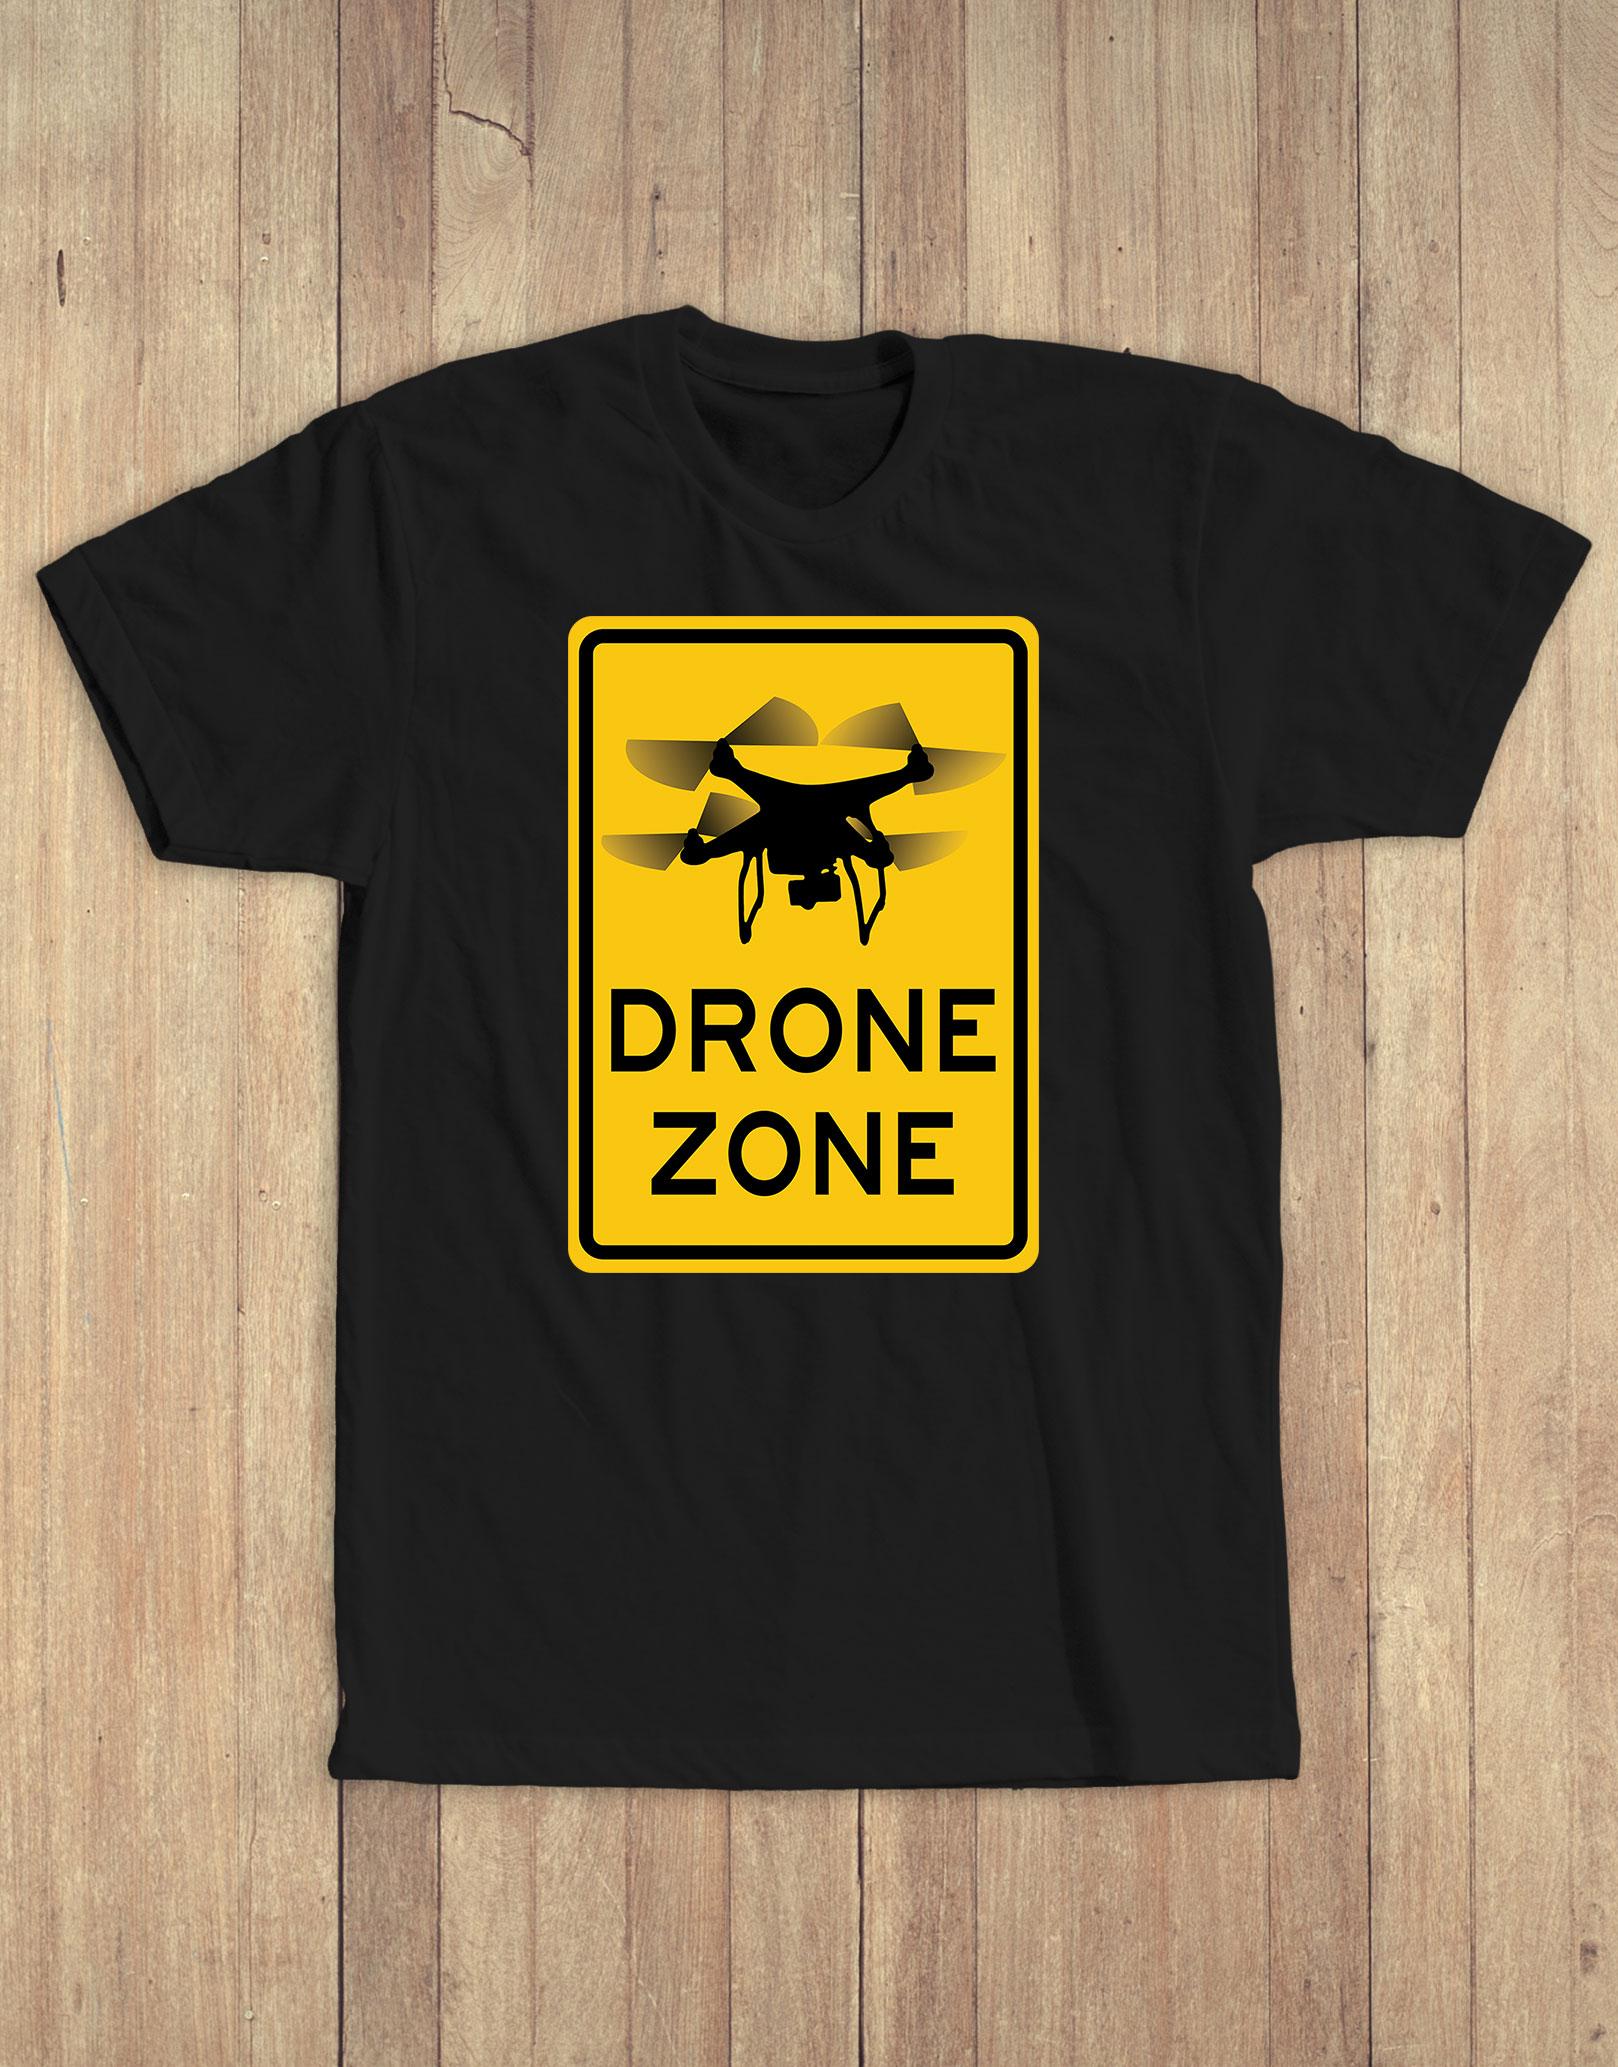 Drone zone tee black